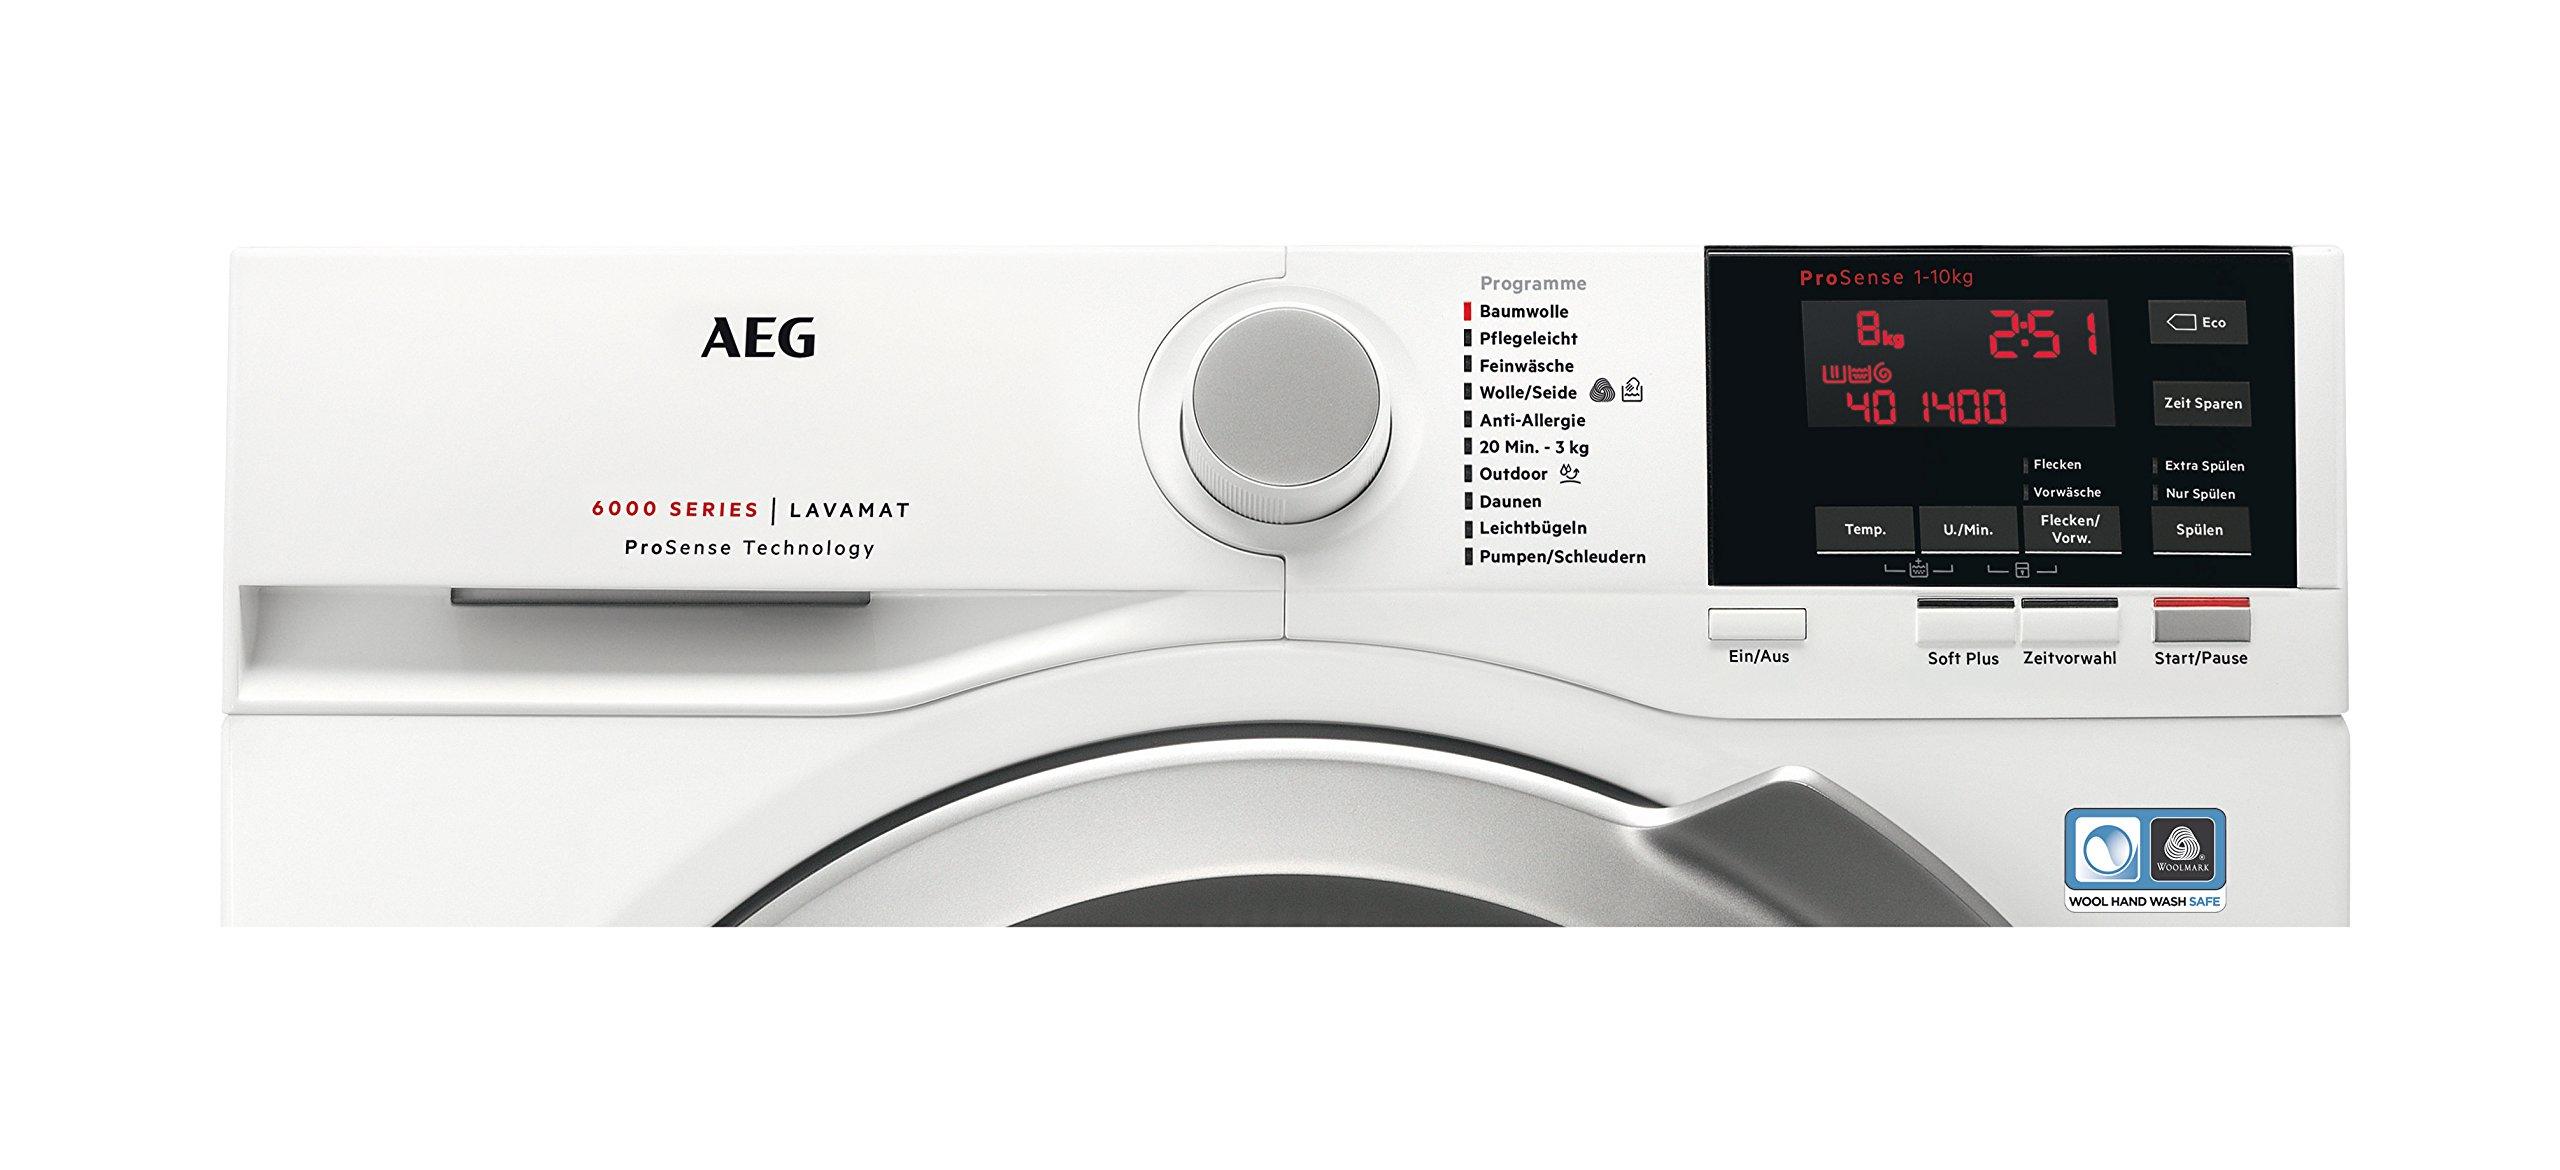 AEG-L6FB67400-Waschmaschine-FrontladerA-1400UpM-Mengenautomatikgroes-FassungsvermgenWei